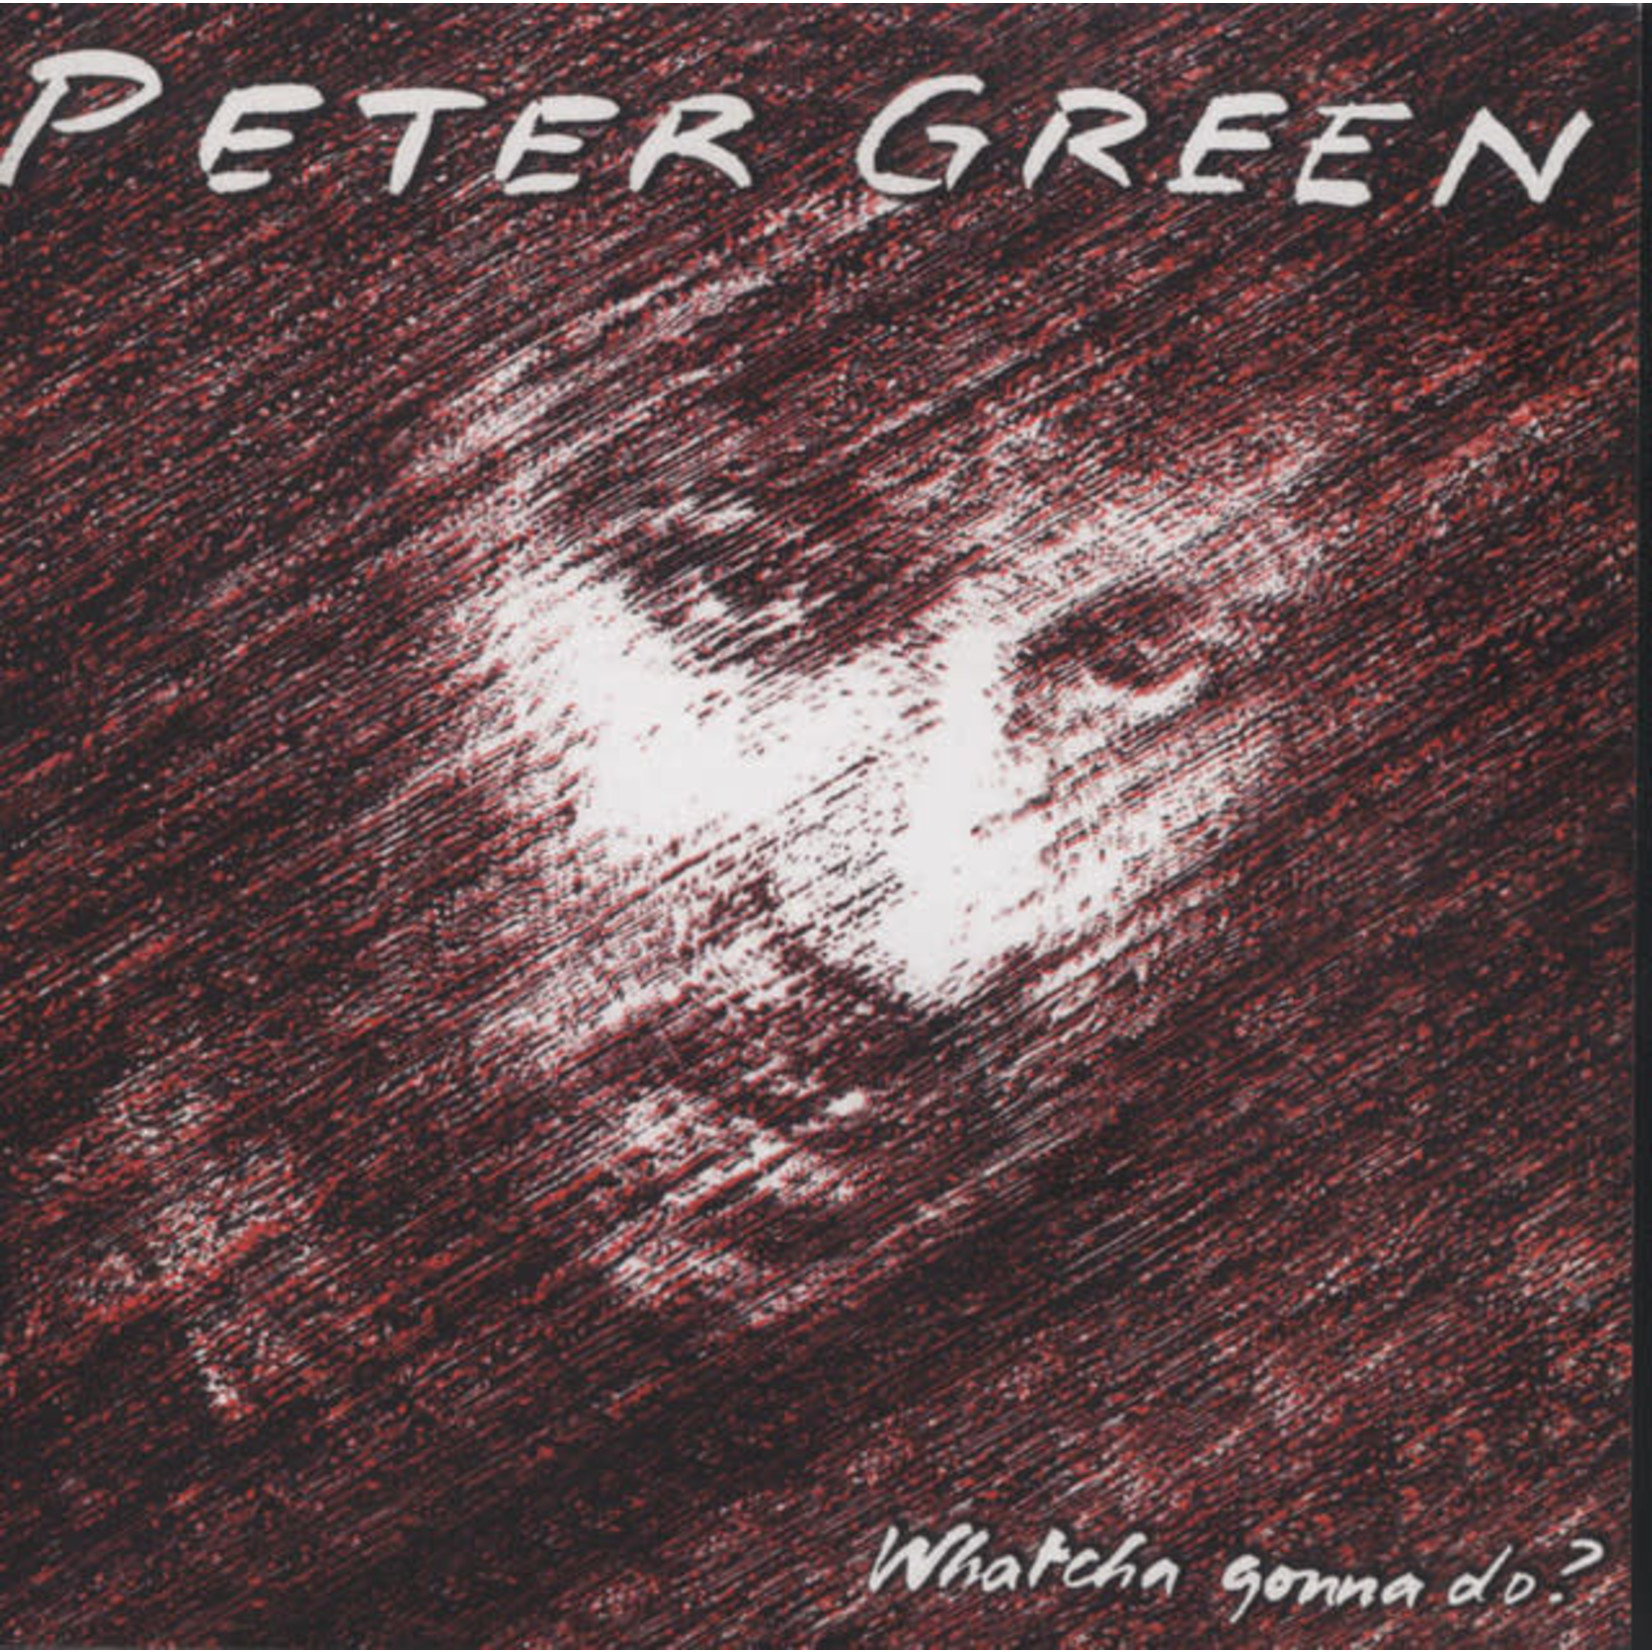 Vinyl Peter Green - Watcha Gonna Do?